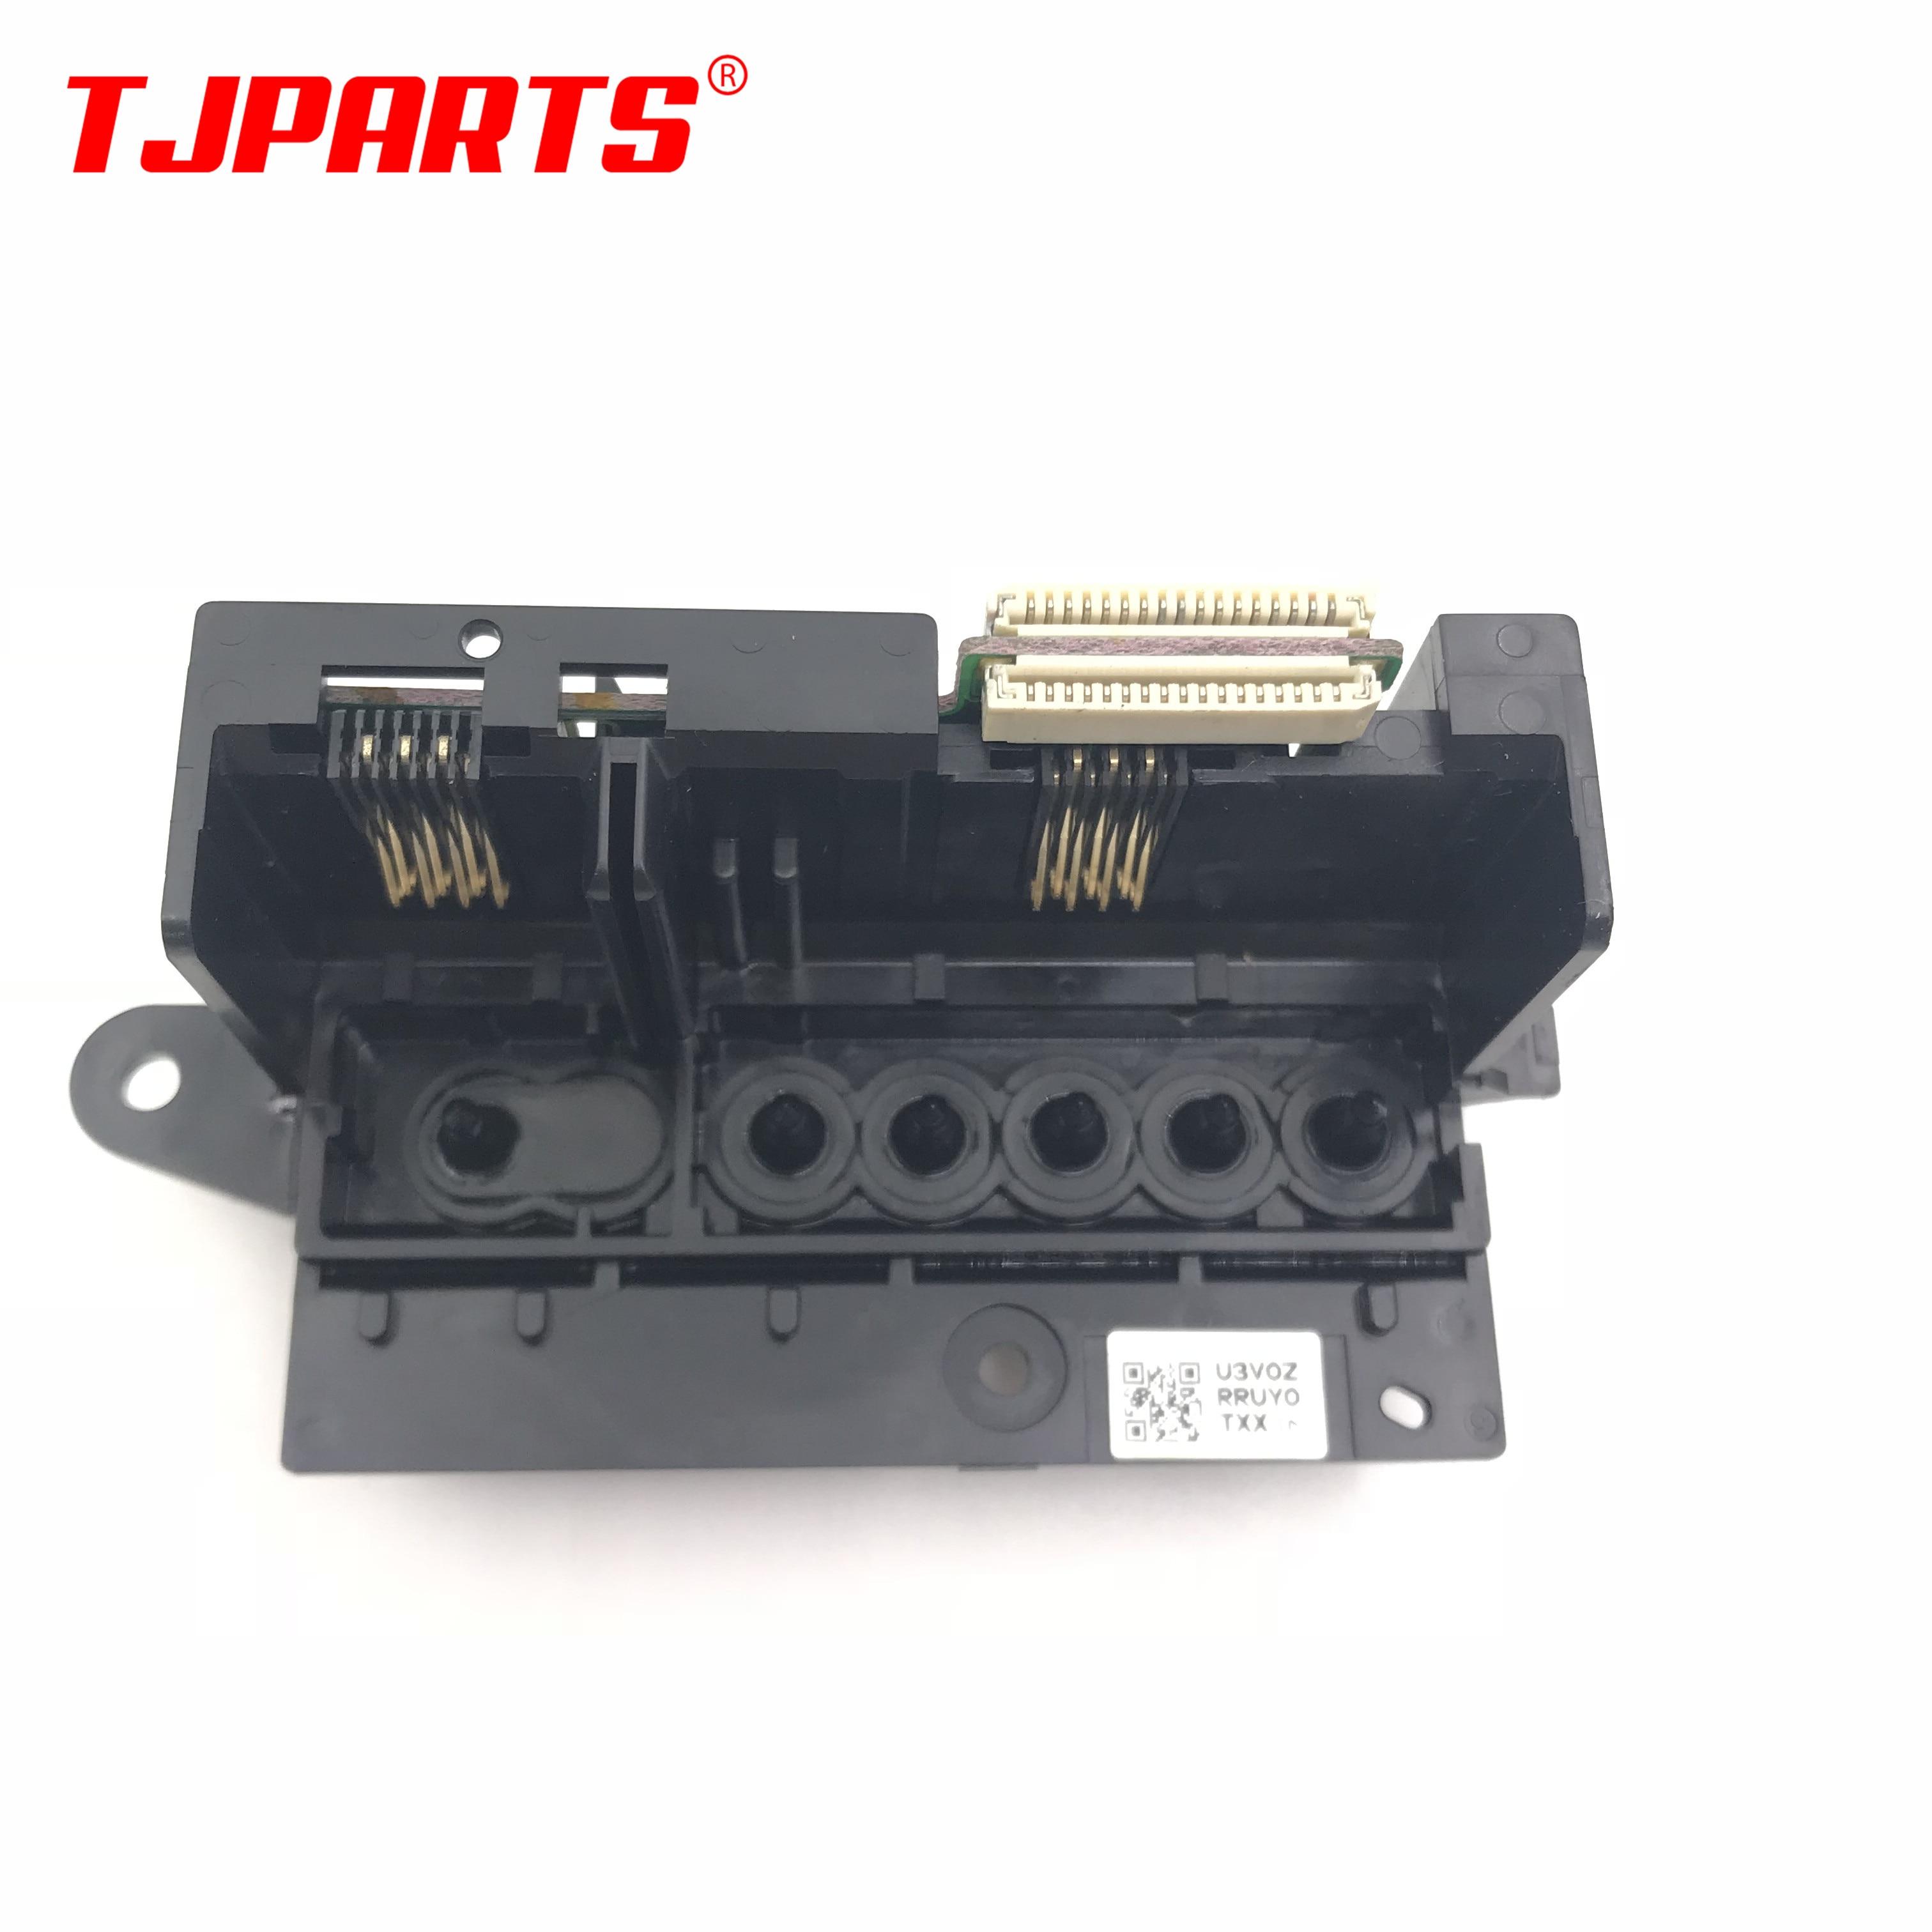 Image 3 - F083000 F083030 Printhead Printer Print Head for Epson Stylus  Photo 790 890 895 1290 1290S 915 900 880Printer Parts